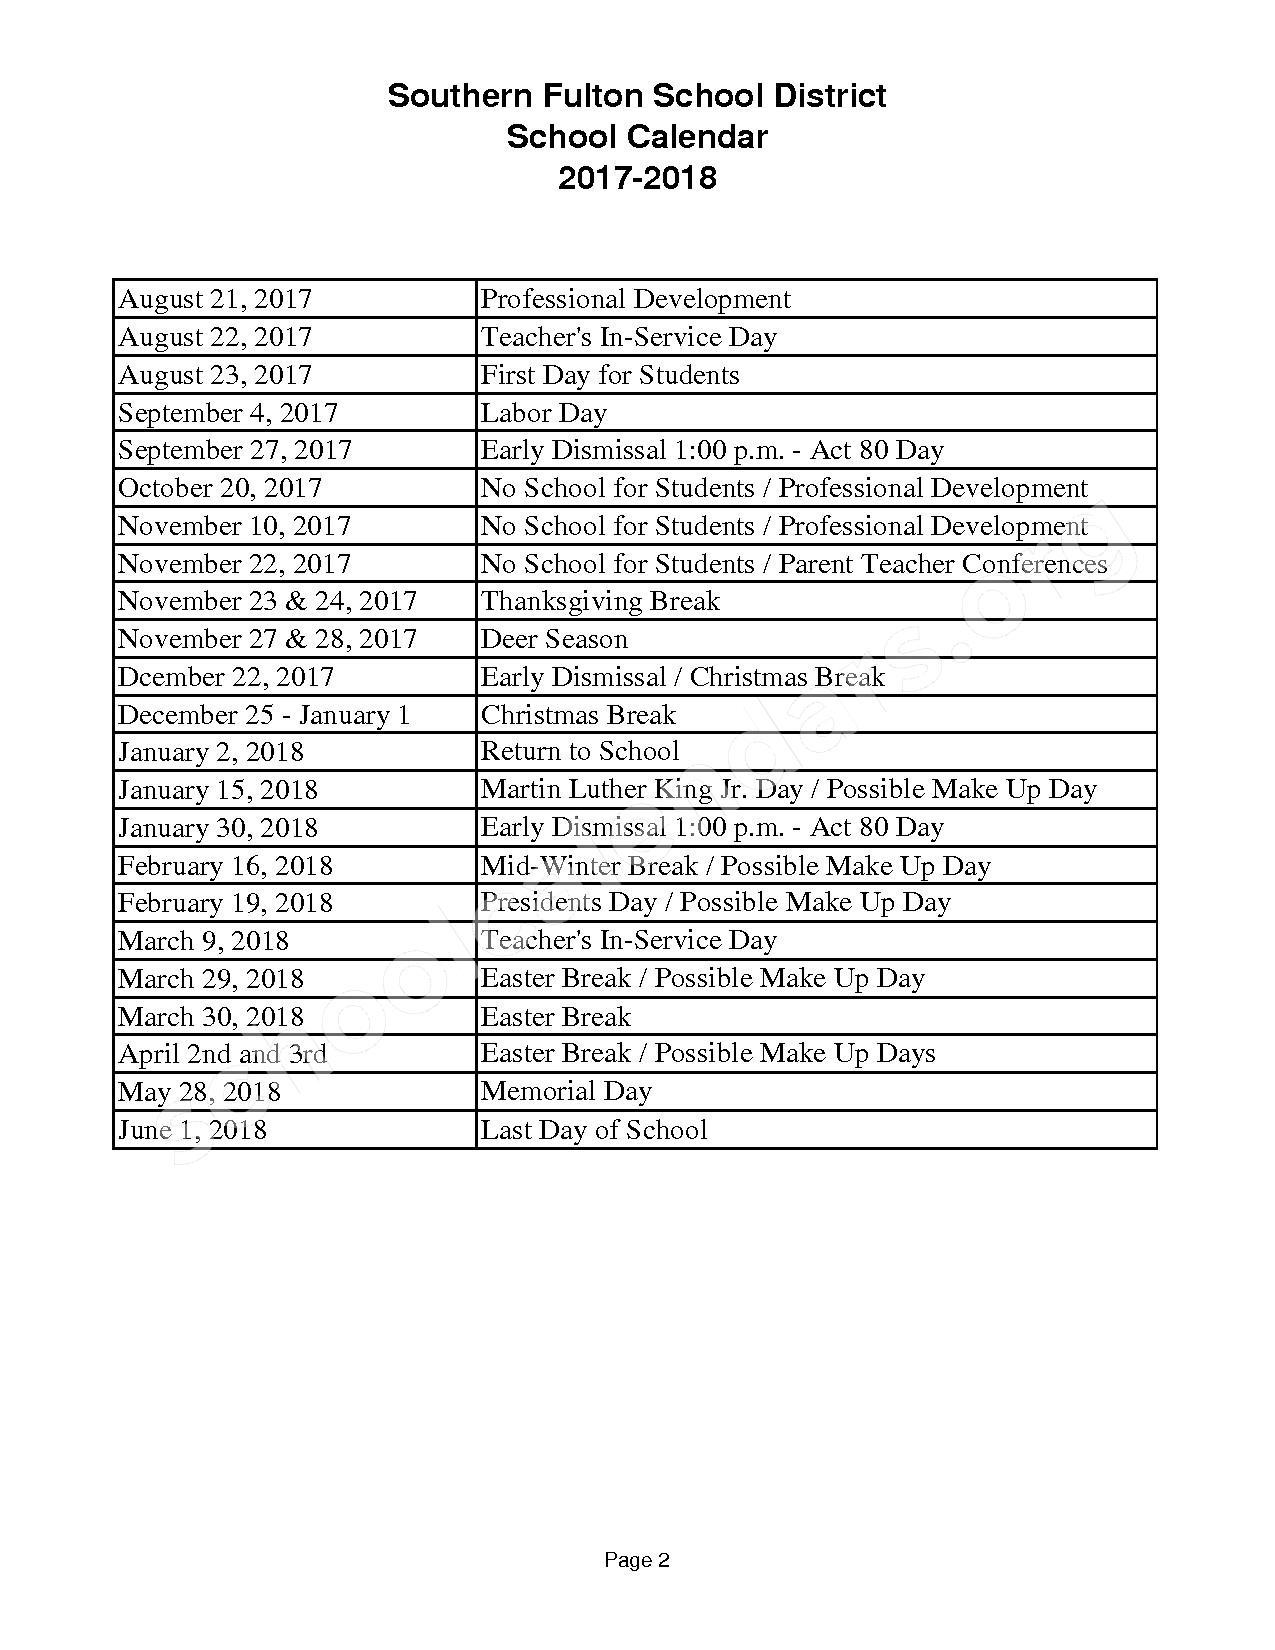 2017 - 2018 District Calendar – Southern Fulton School District – page 2